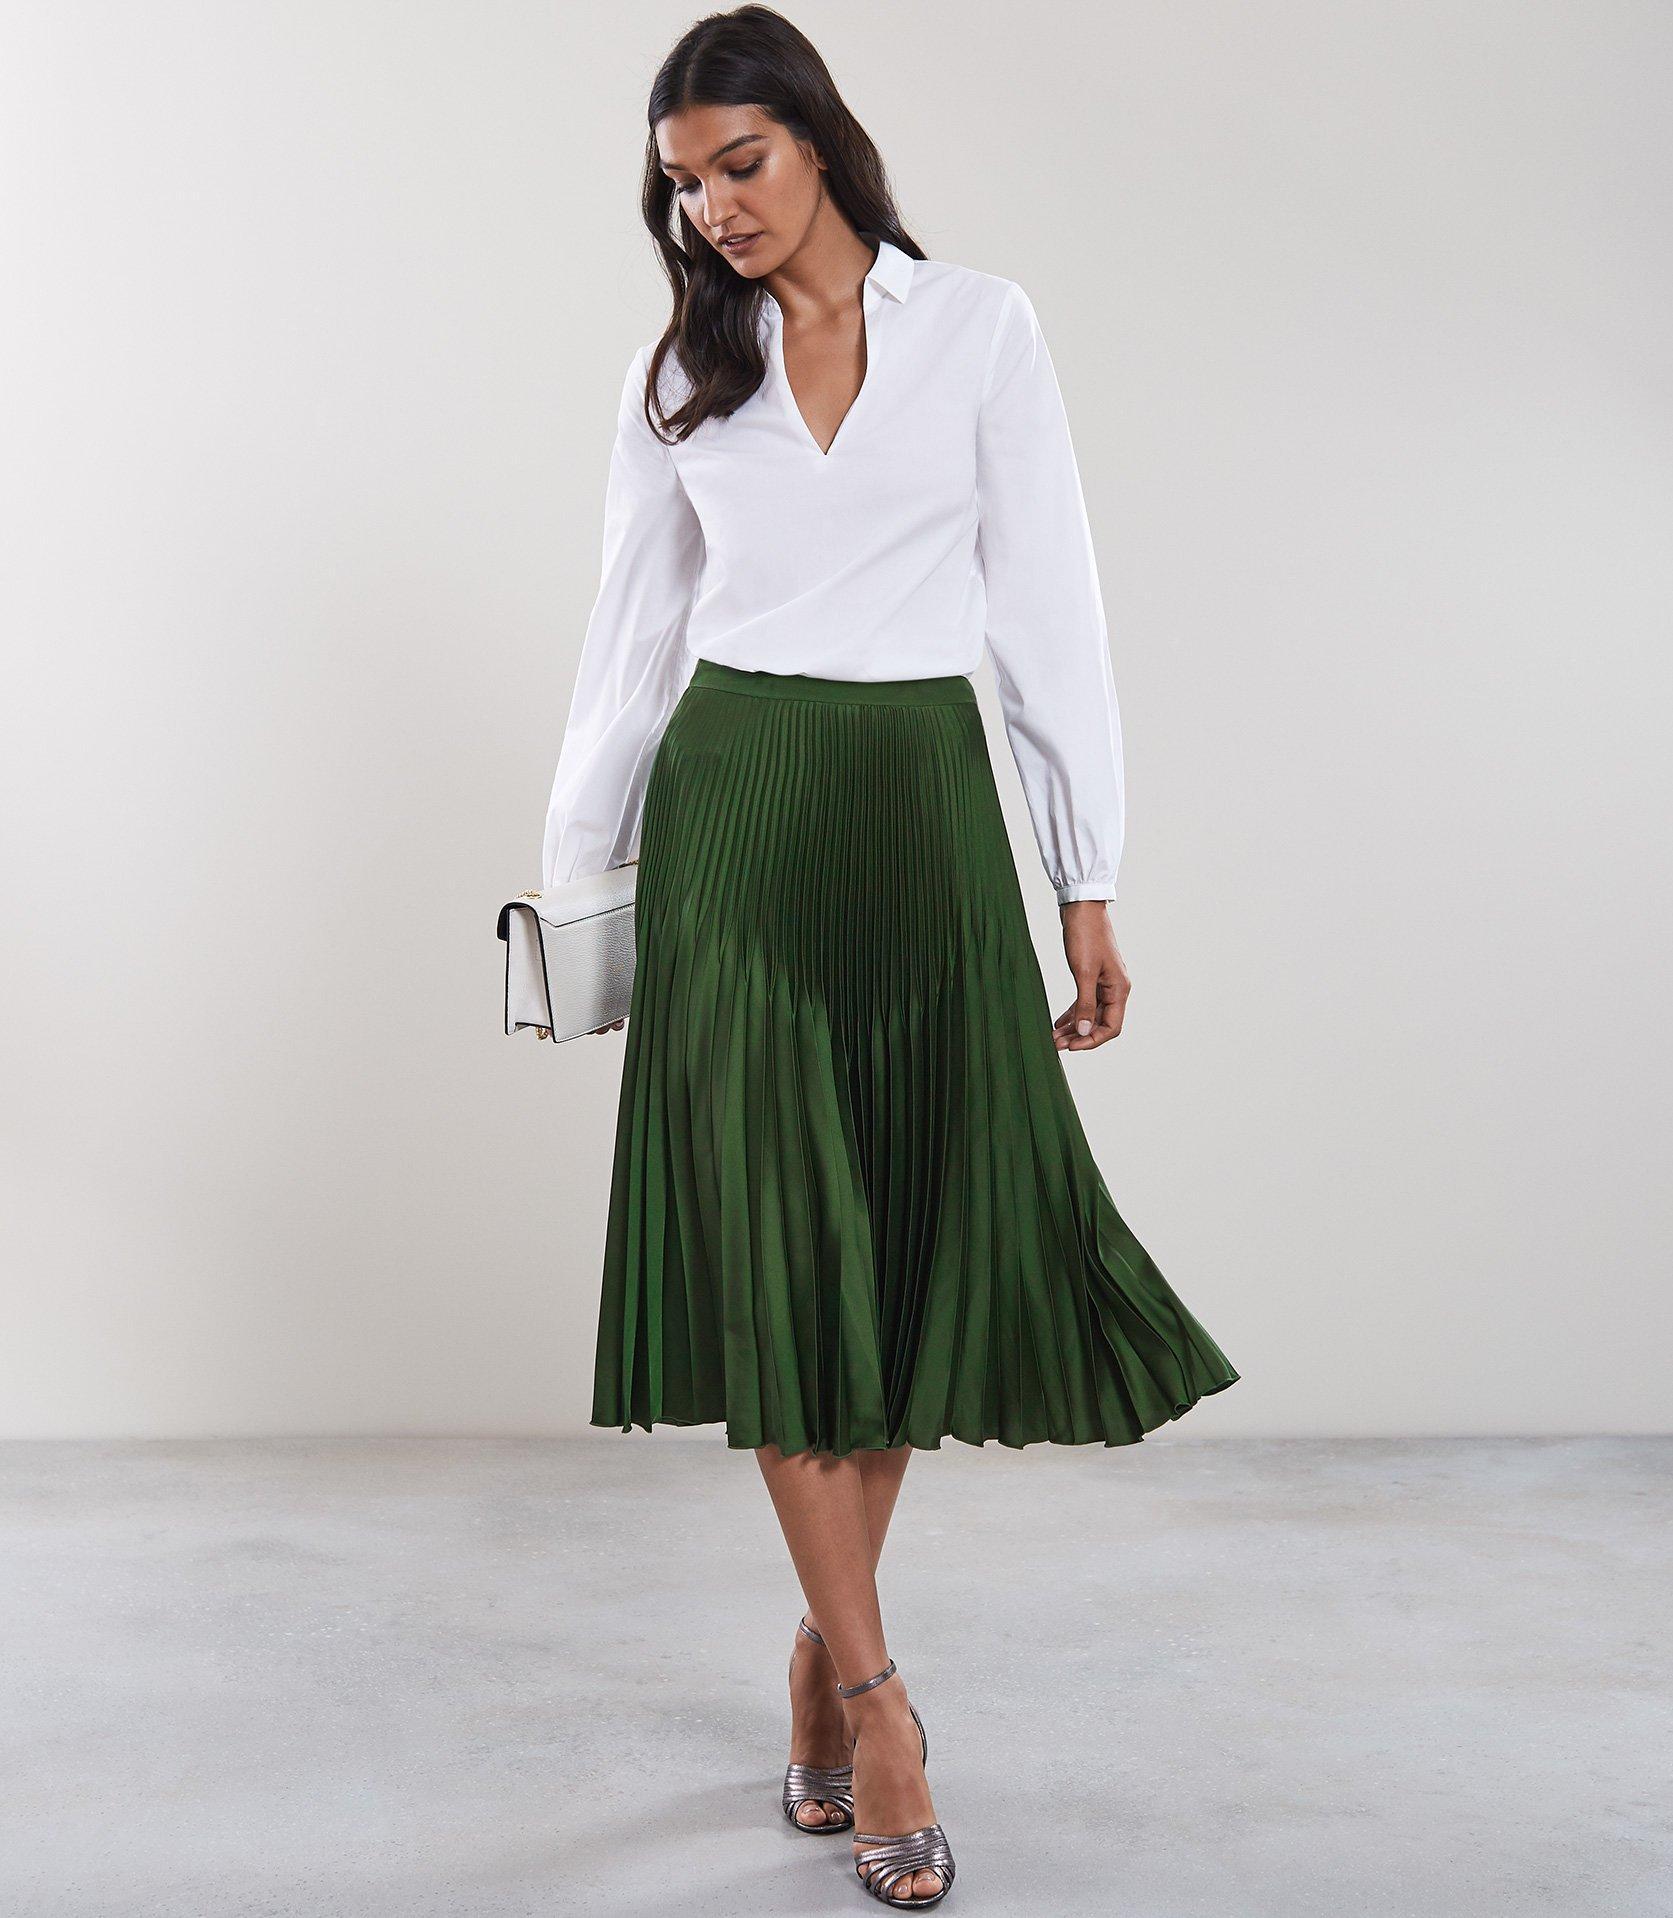 886cd6c72 Reiss Isidora - Knife Pleat Skirt in Green - Lyst